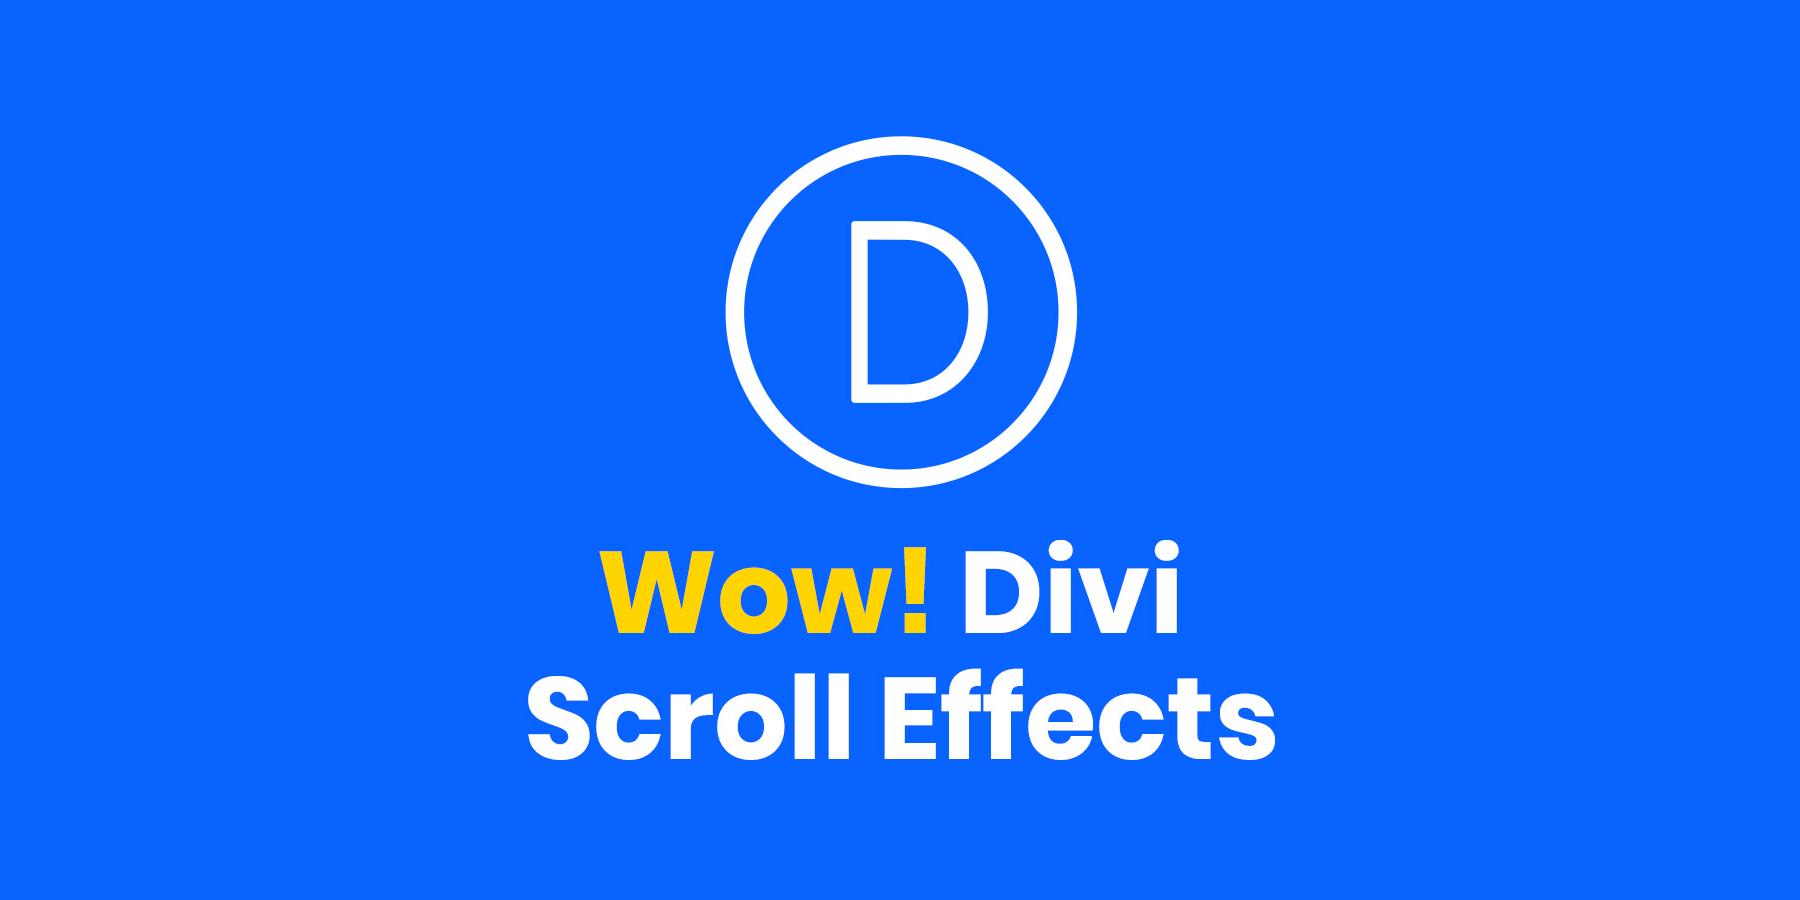 Divi Scroll Effects